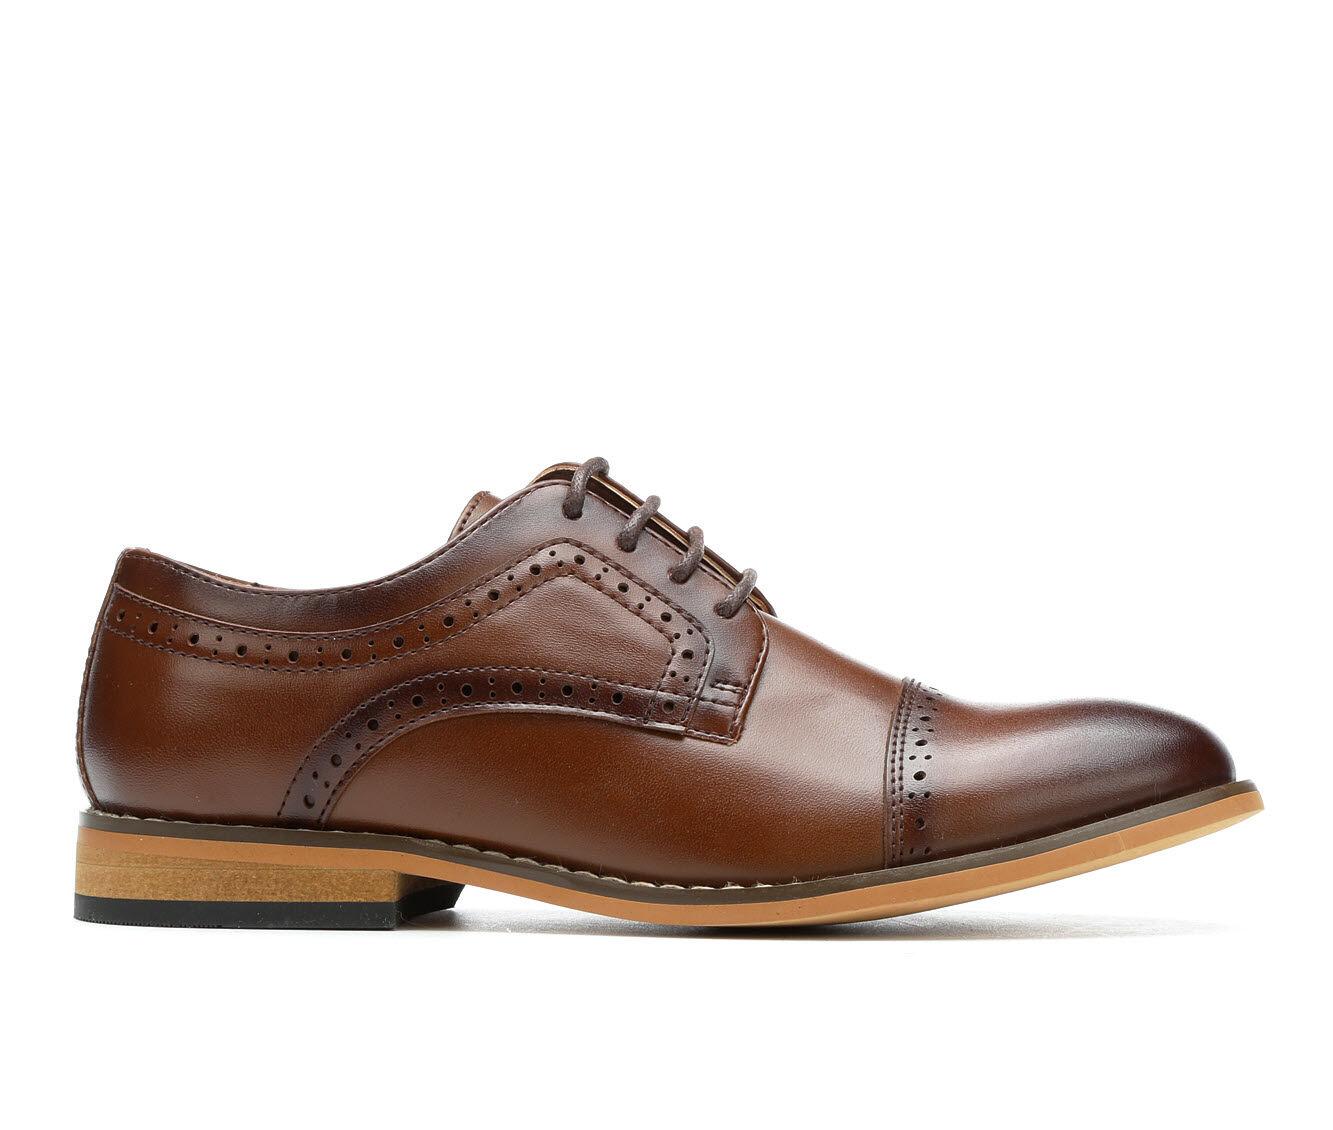 Boys' Dress Shoes: Oxfords \u0026 Loafers